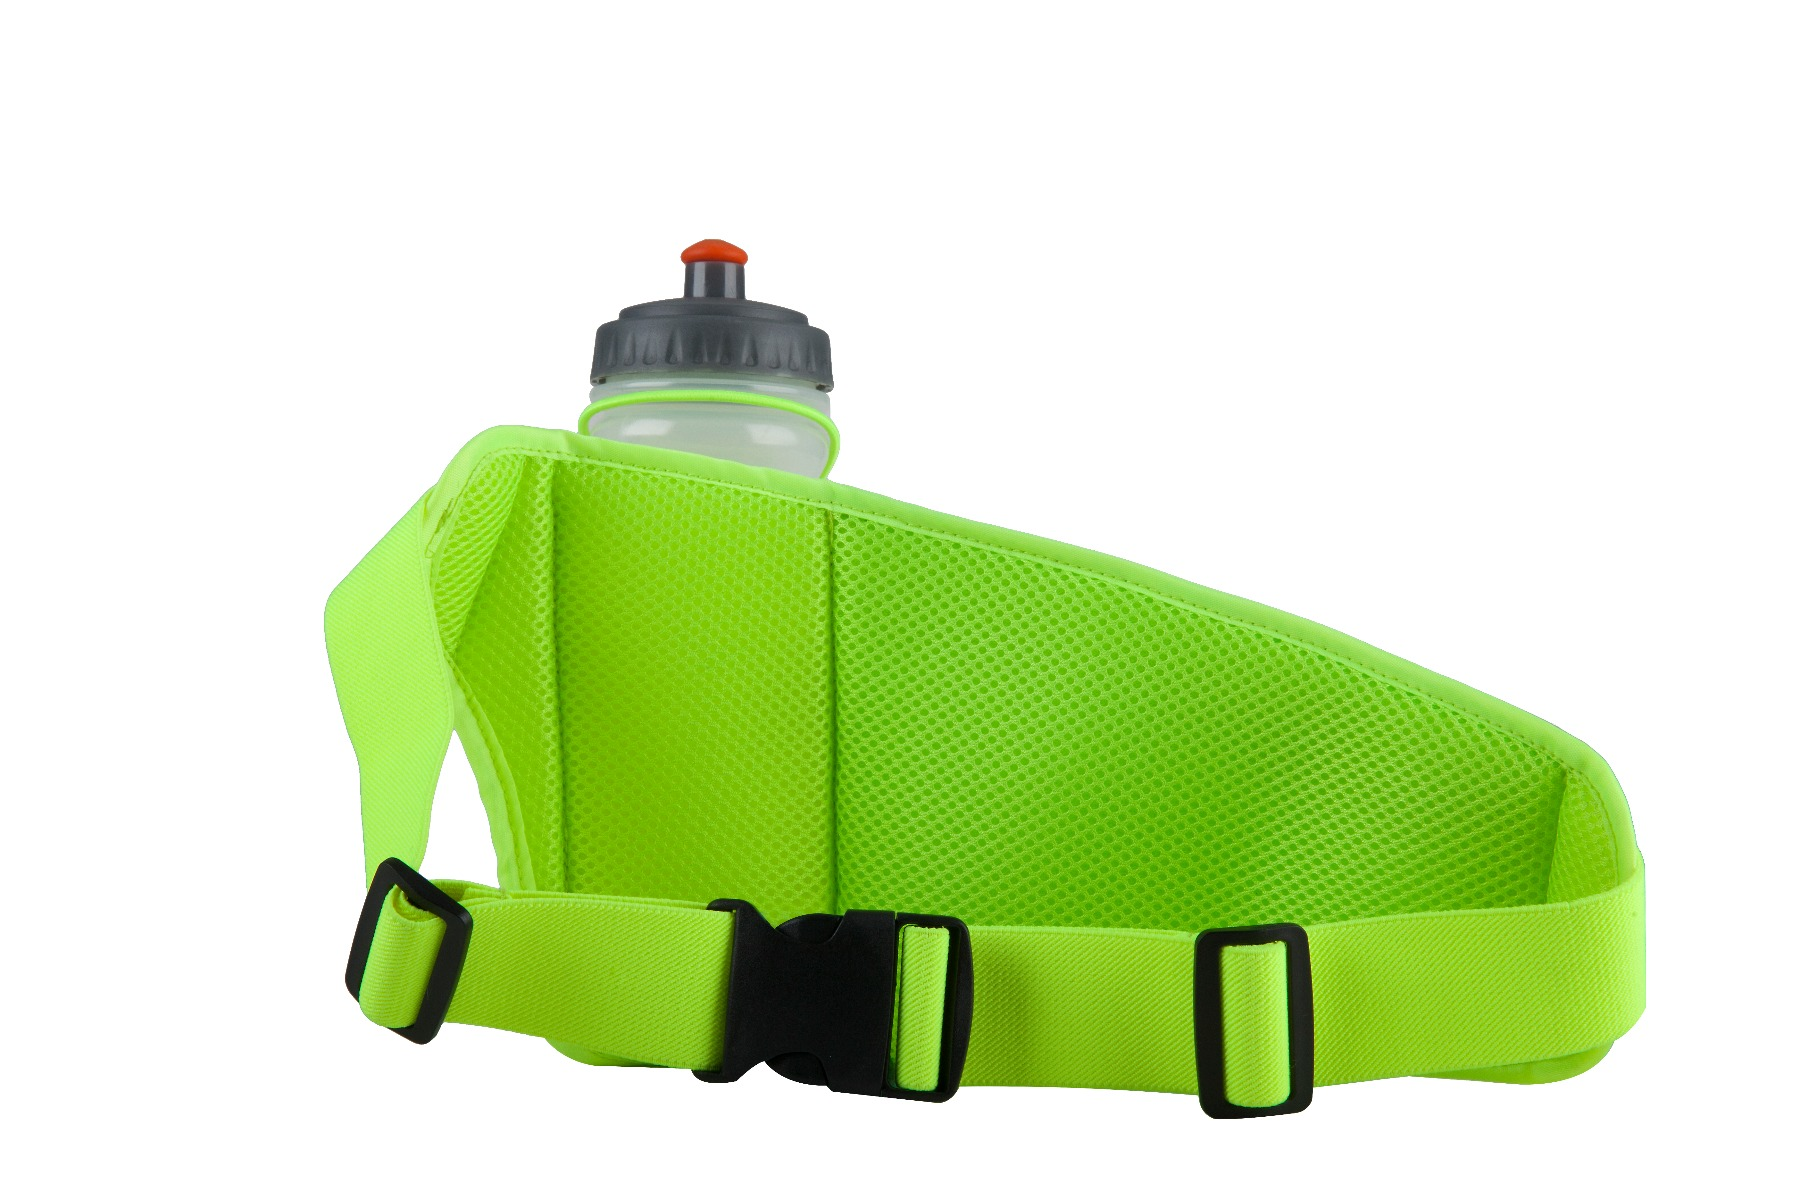 fashionable waist bag